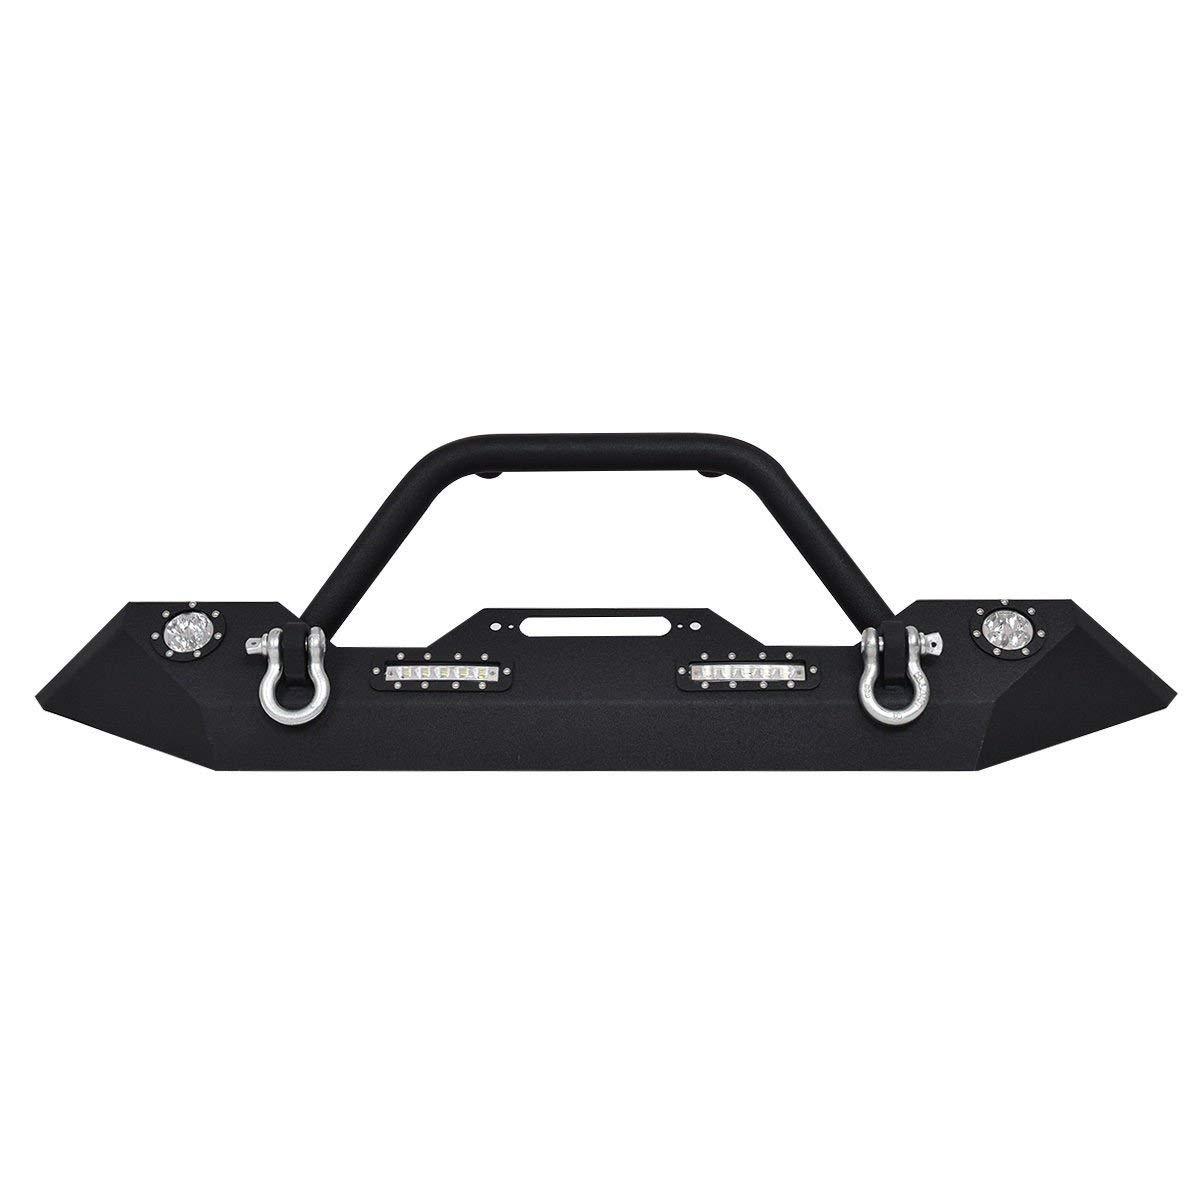 c25a245214 Amazon.com: Goplus Front Bumper w/Hooks & Fog Light Hole for 2007-2016 Jeep  Wrangler JK (Front Bumper- Led Light): Automotive